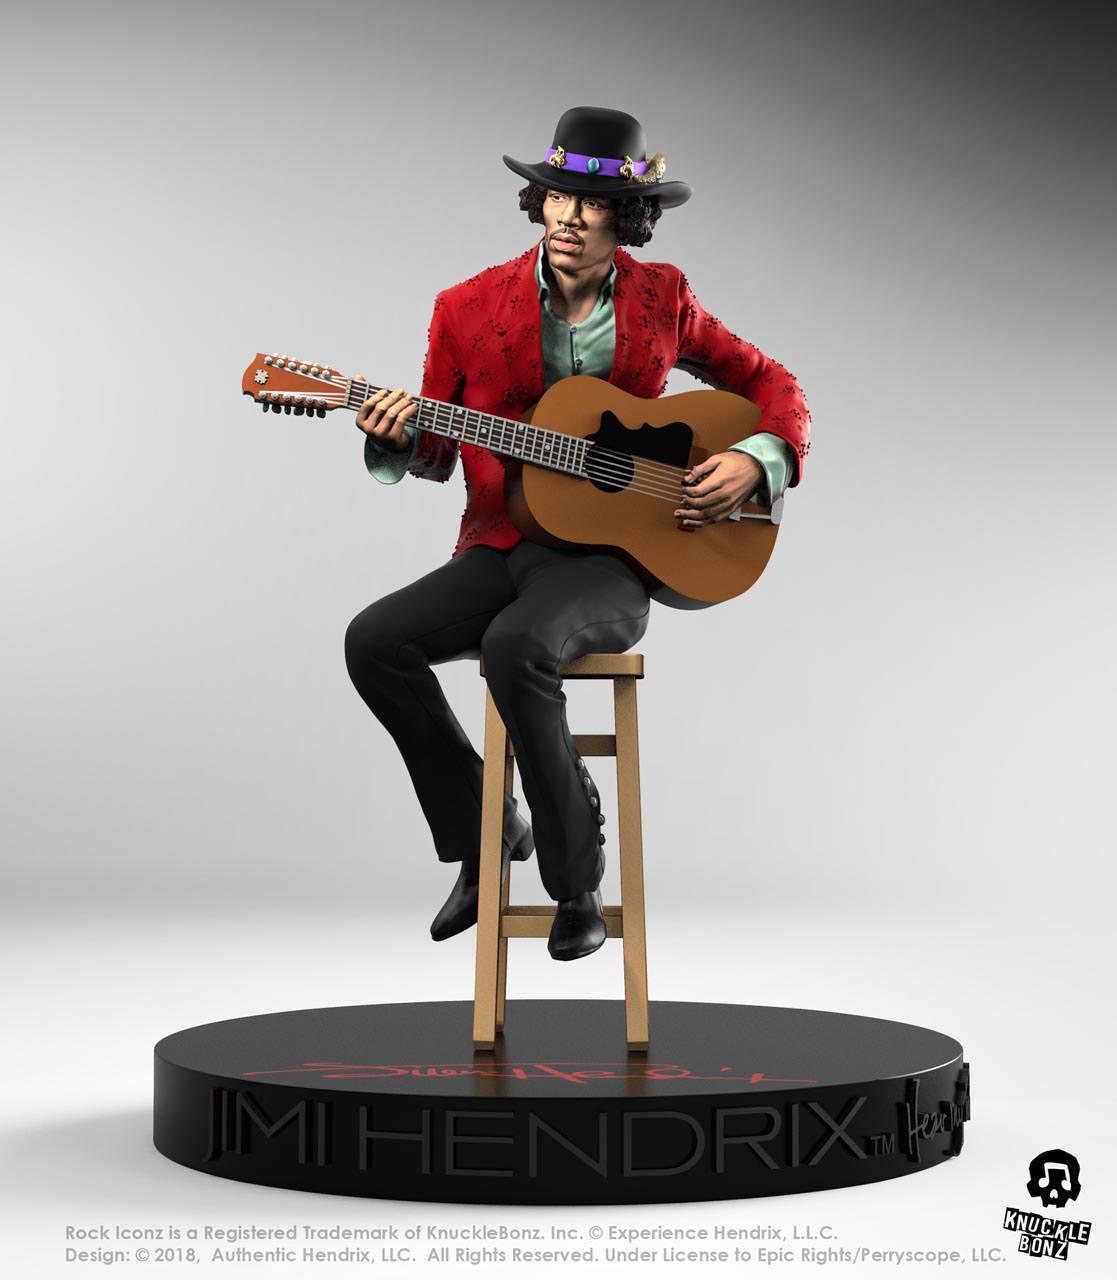 Jimi Hendrix II Jimi Hendrix Rock Iconz 1/9 Statue by Knucklebonz